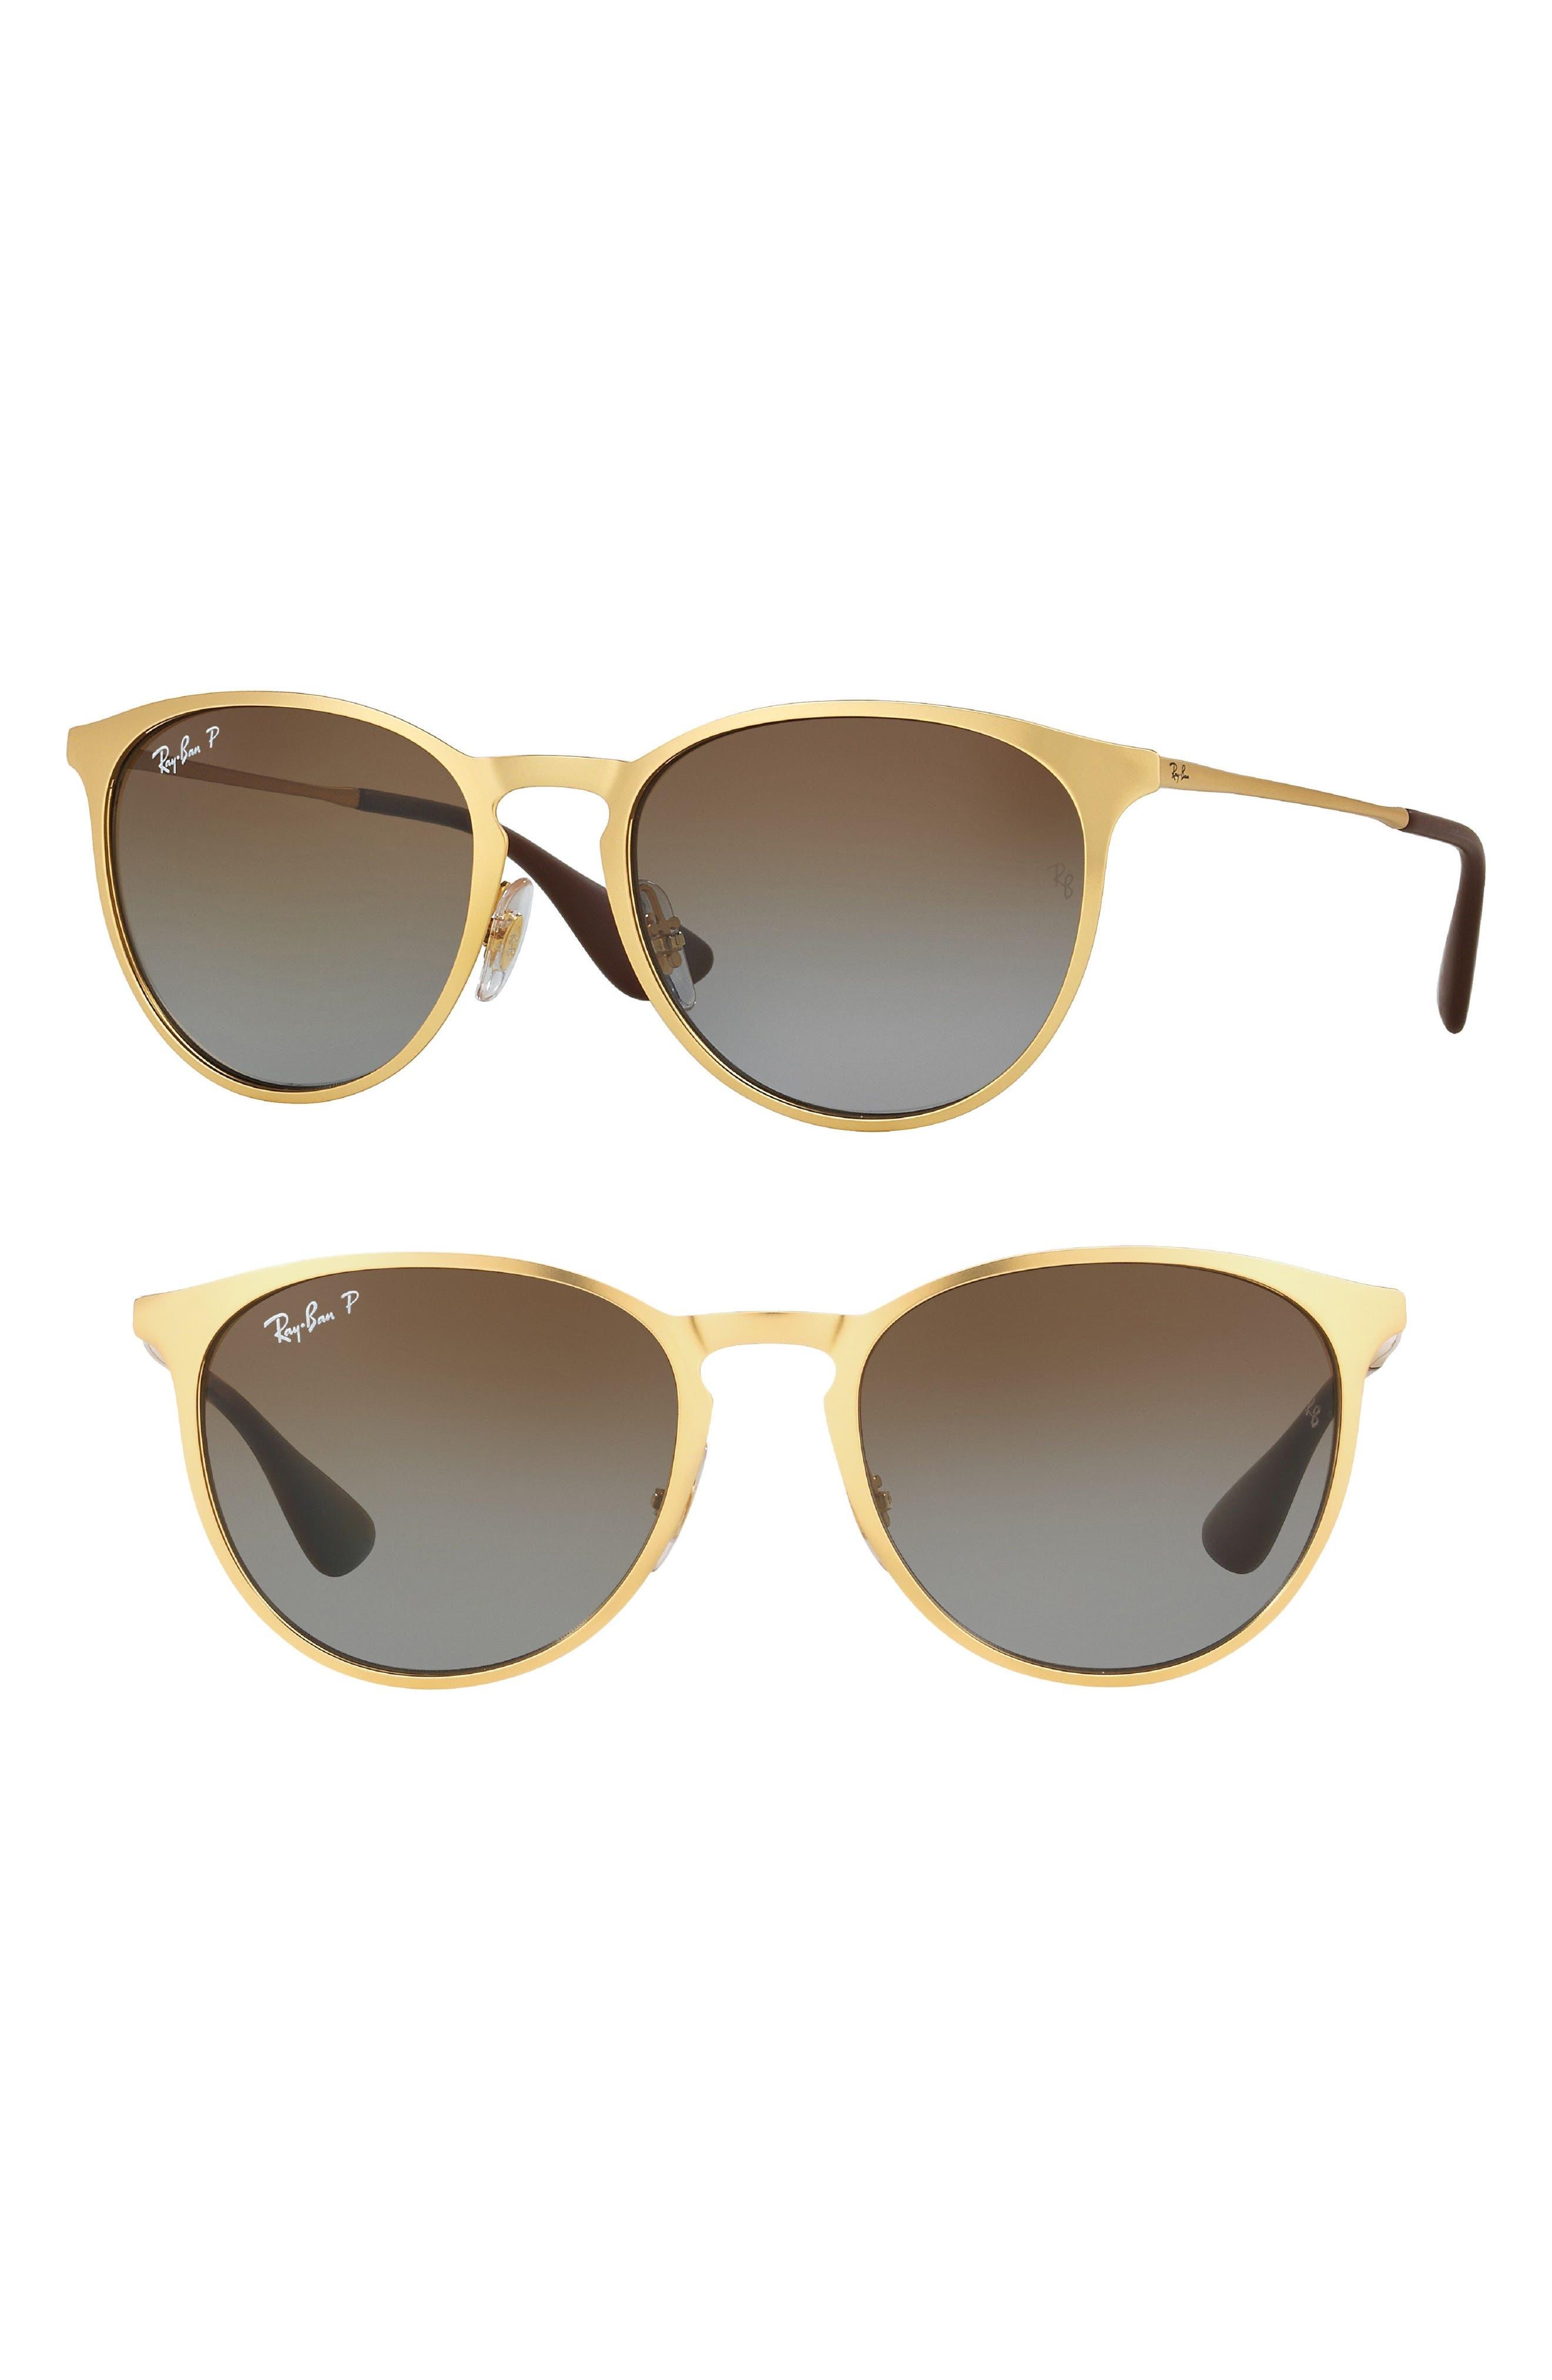 Ray-Ban Erika 54mm Sunglasses